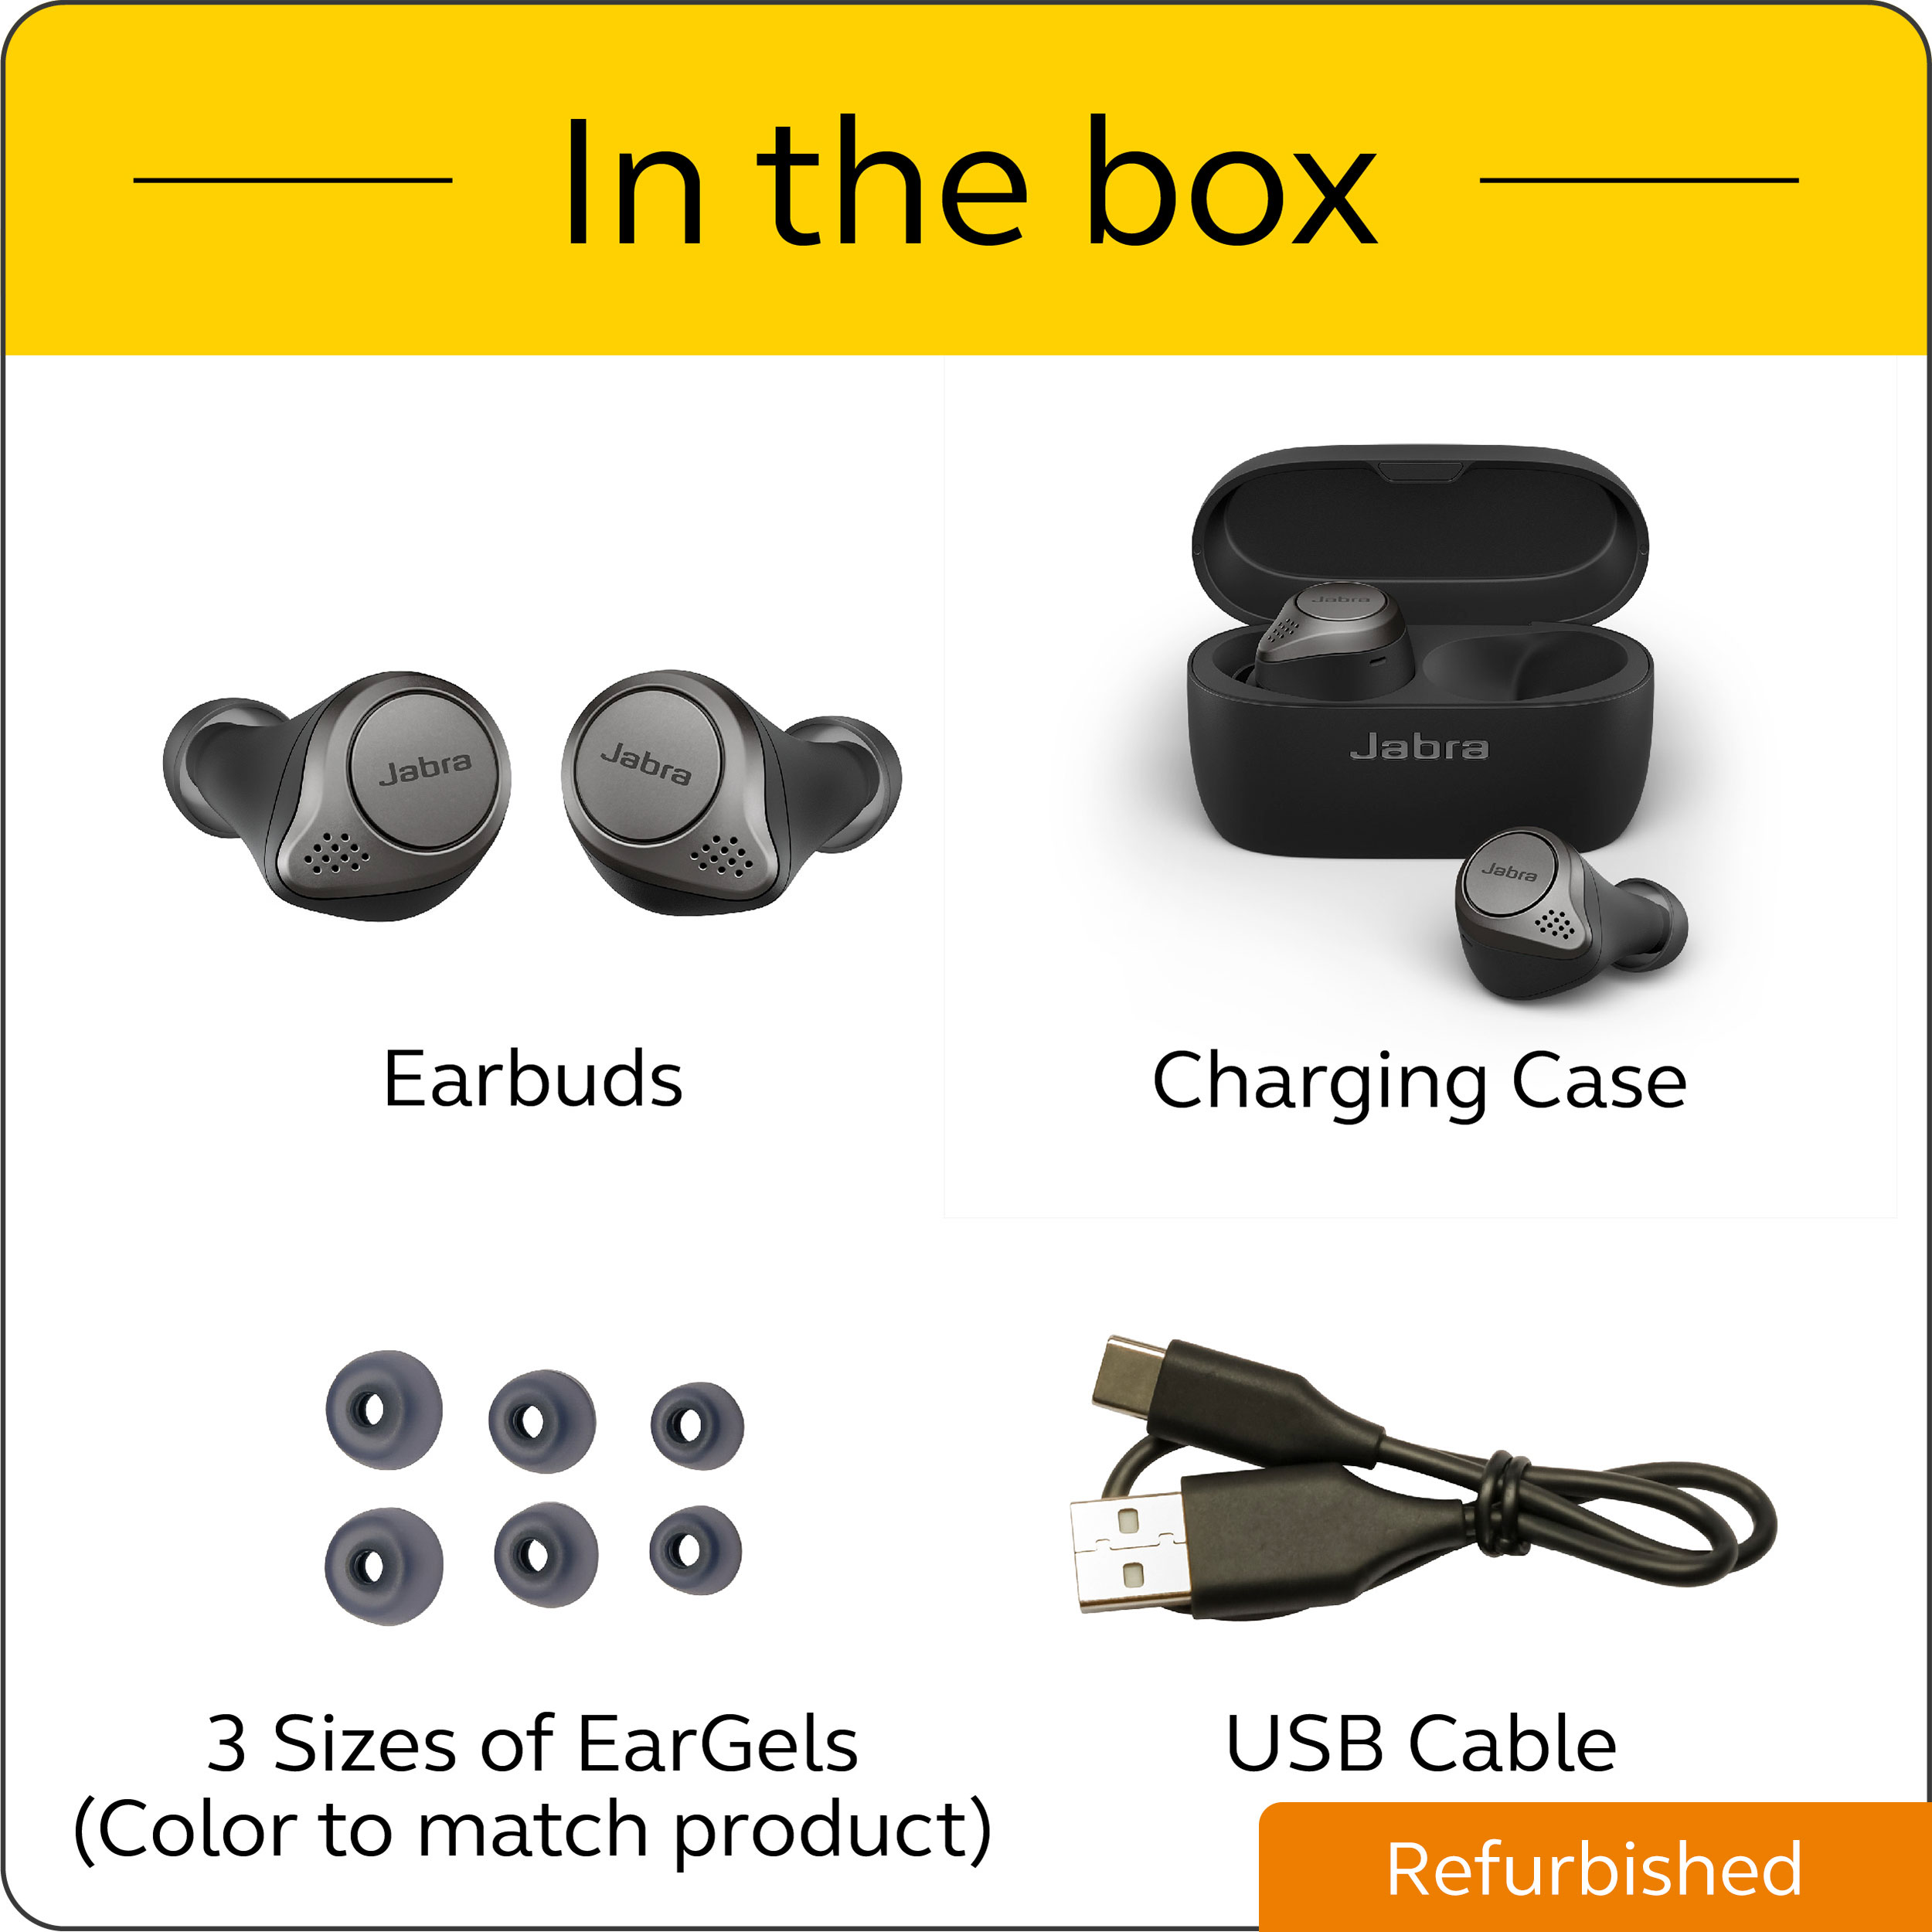 thumbnail 20 - Jabra-Elite-75t-Voice-Assistant-True-Wireless-earbuds-Certified-Refurbished